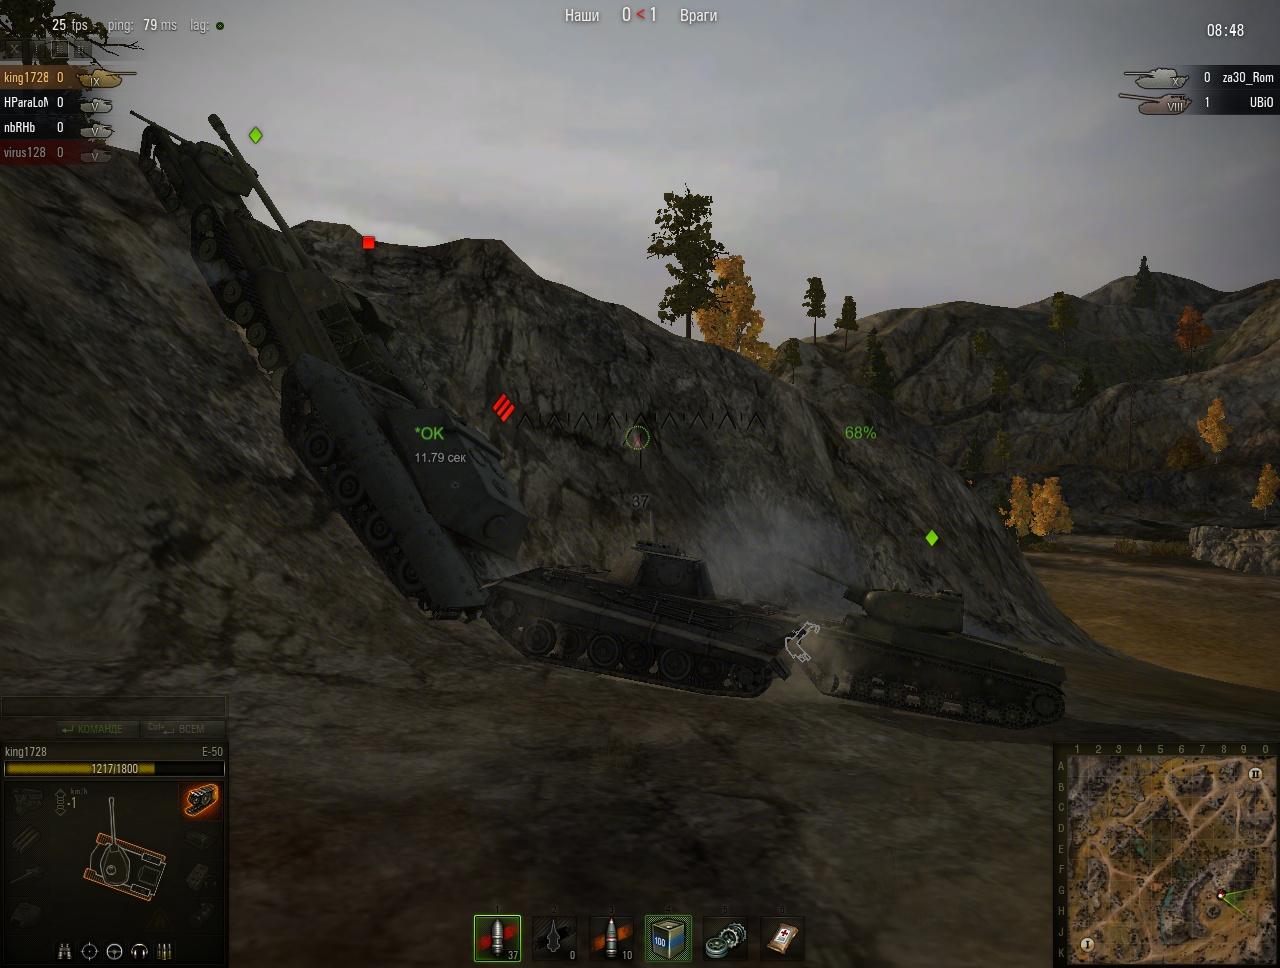 Screenshots et rapports de batailles - Page 5 611857fed83ea06f162af4e172ef6488